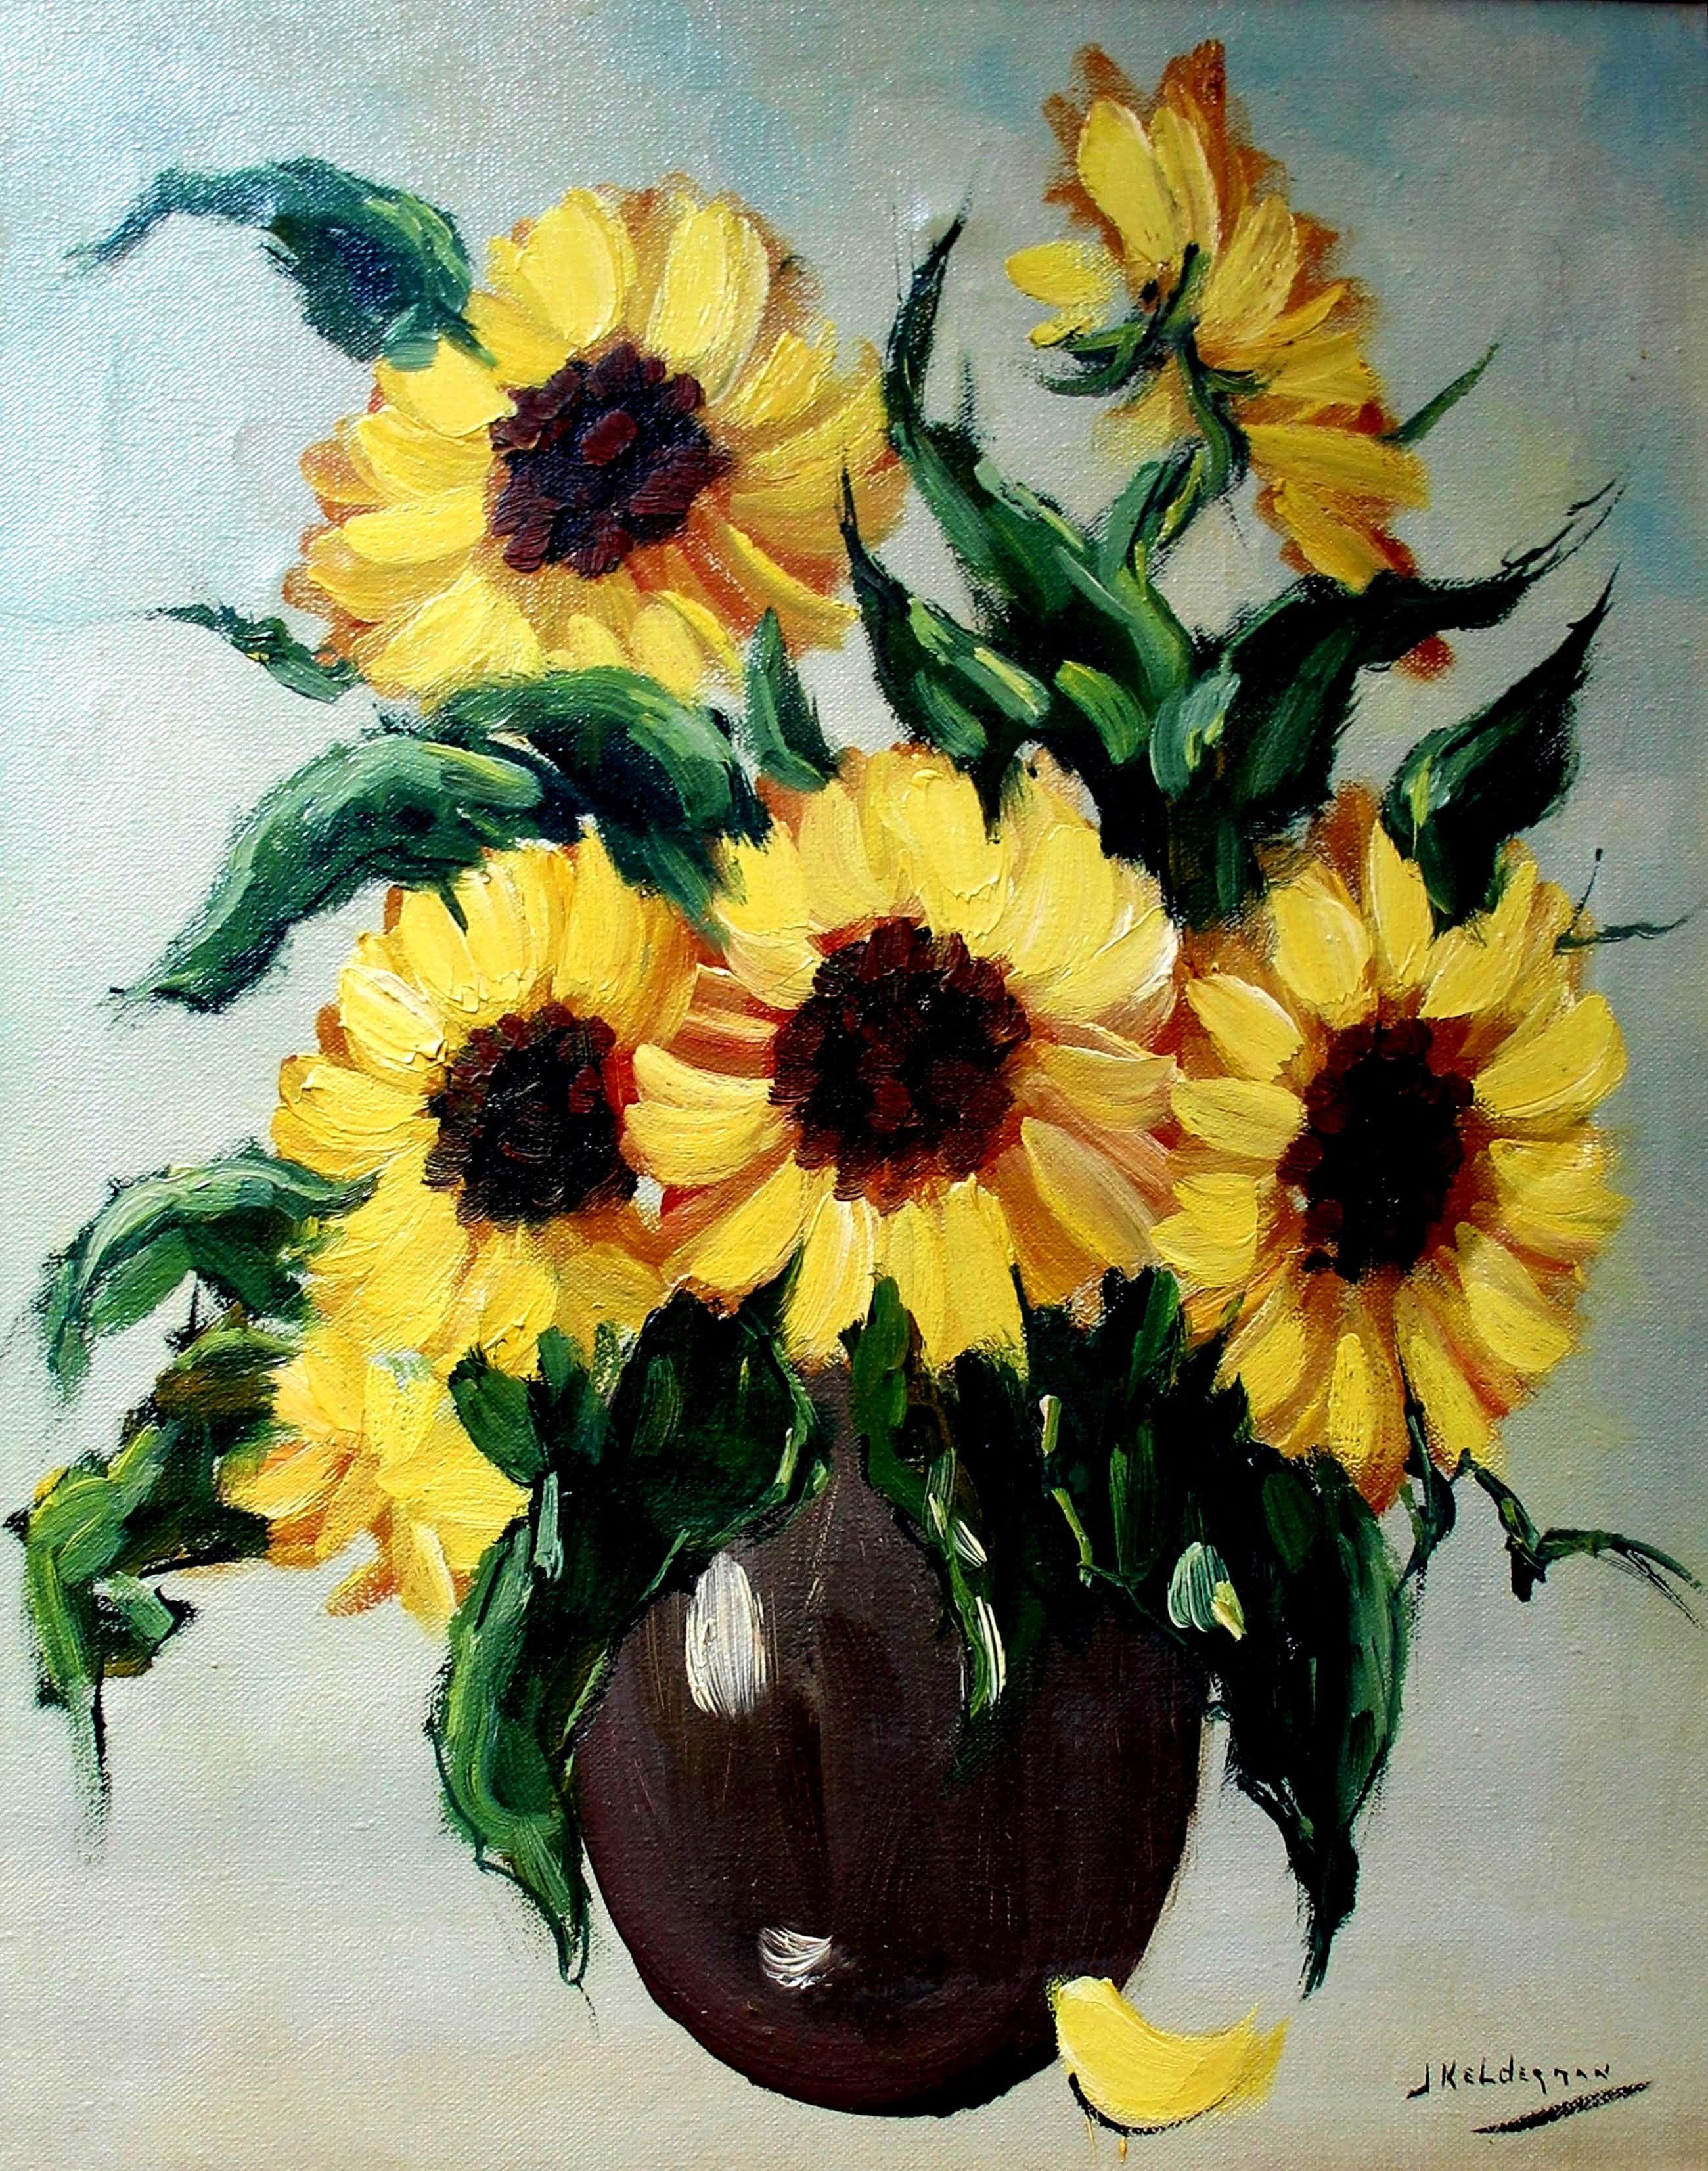 Jan Kelderman - Acryl op doek - vaas met zonnebloemen kopen? Bied vanaf 70!